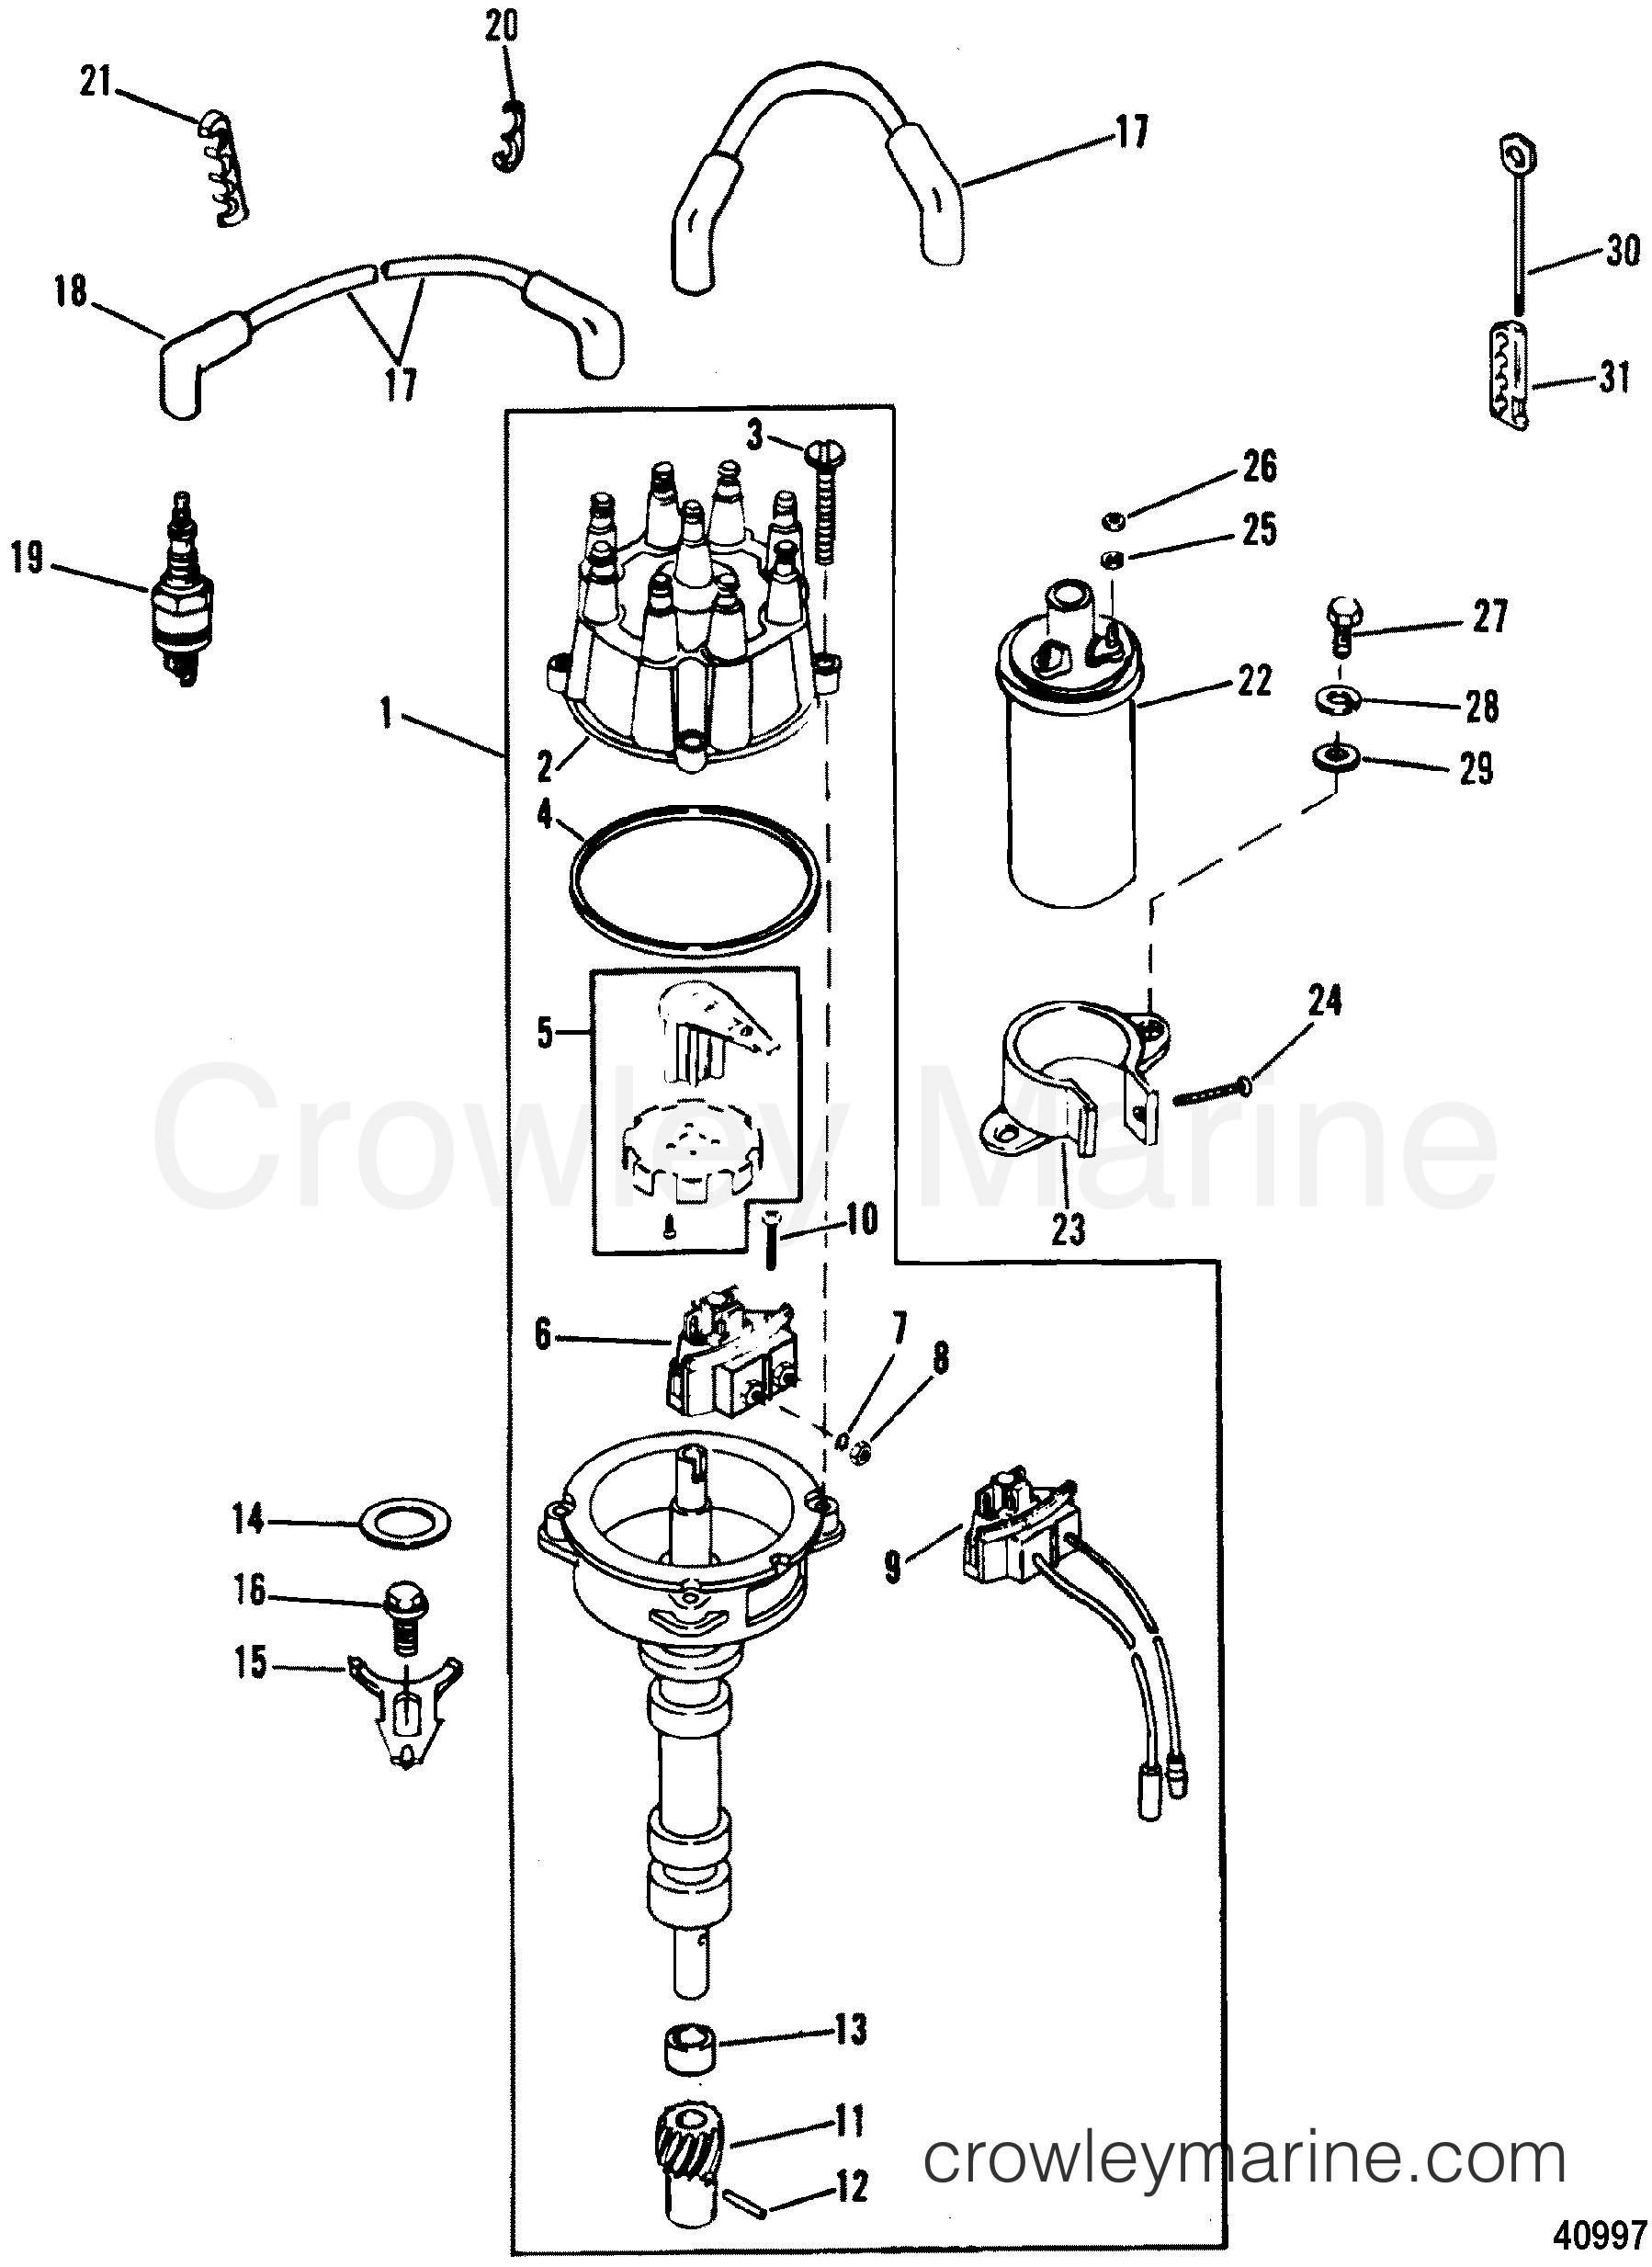 Wiring Diagram For Mercury Brunswick Corp.16ft Jon Boat